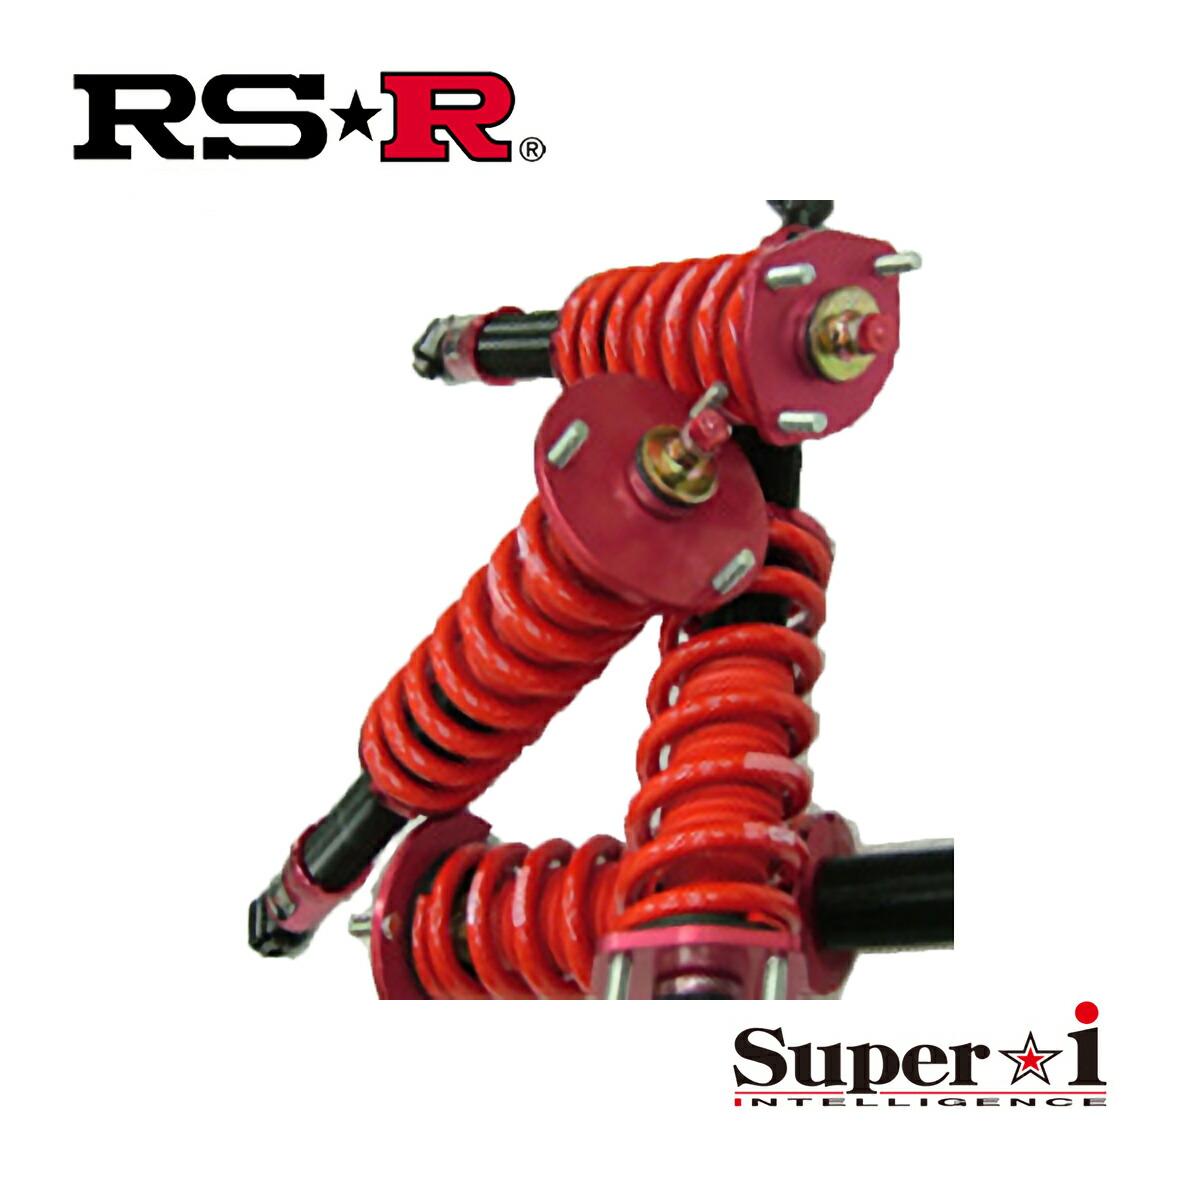 RS-R クラウンハイブリッド AZSH20 RSアドバンス 車高調 リア車高調整:ネジ式/ソフトバネレート仕様 SIT967S スーパーi RSR 個人宅発送追金有